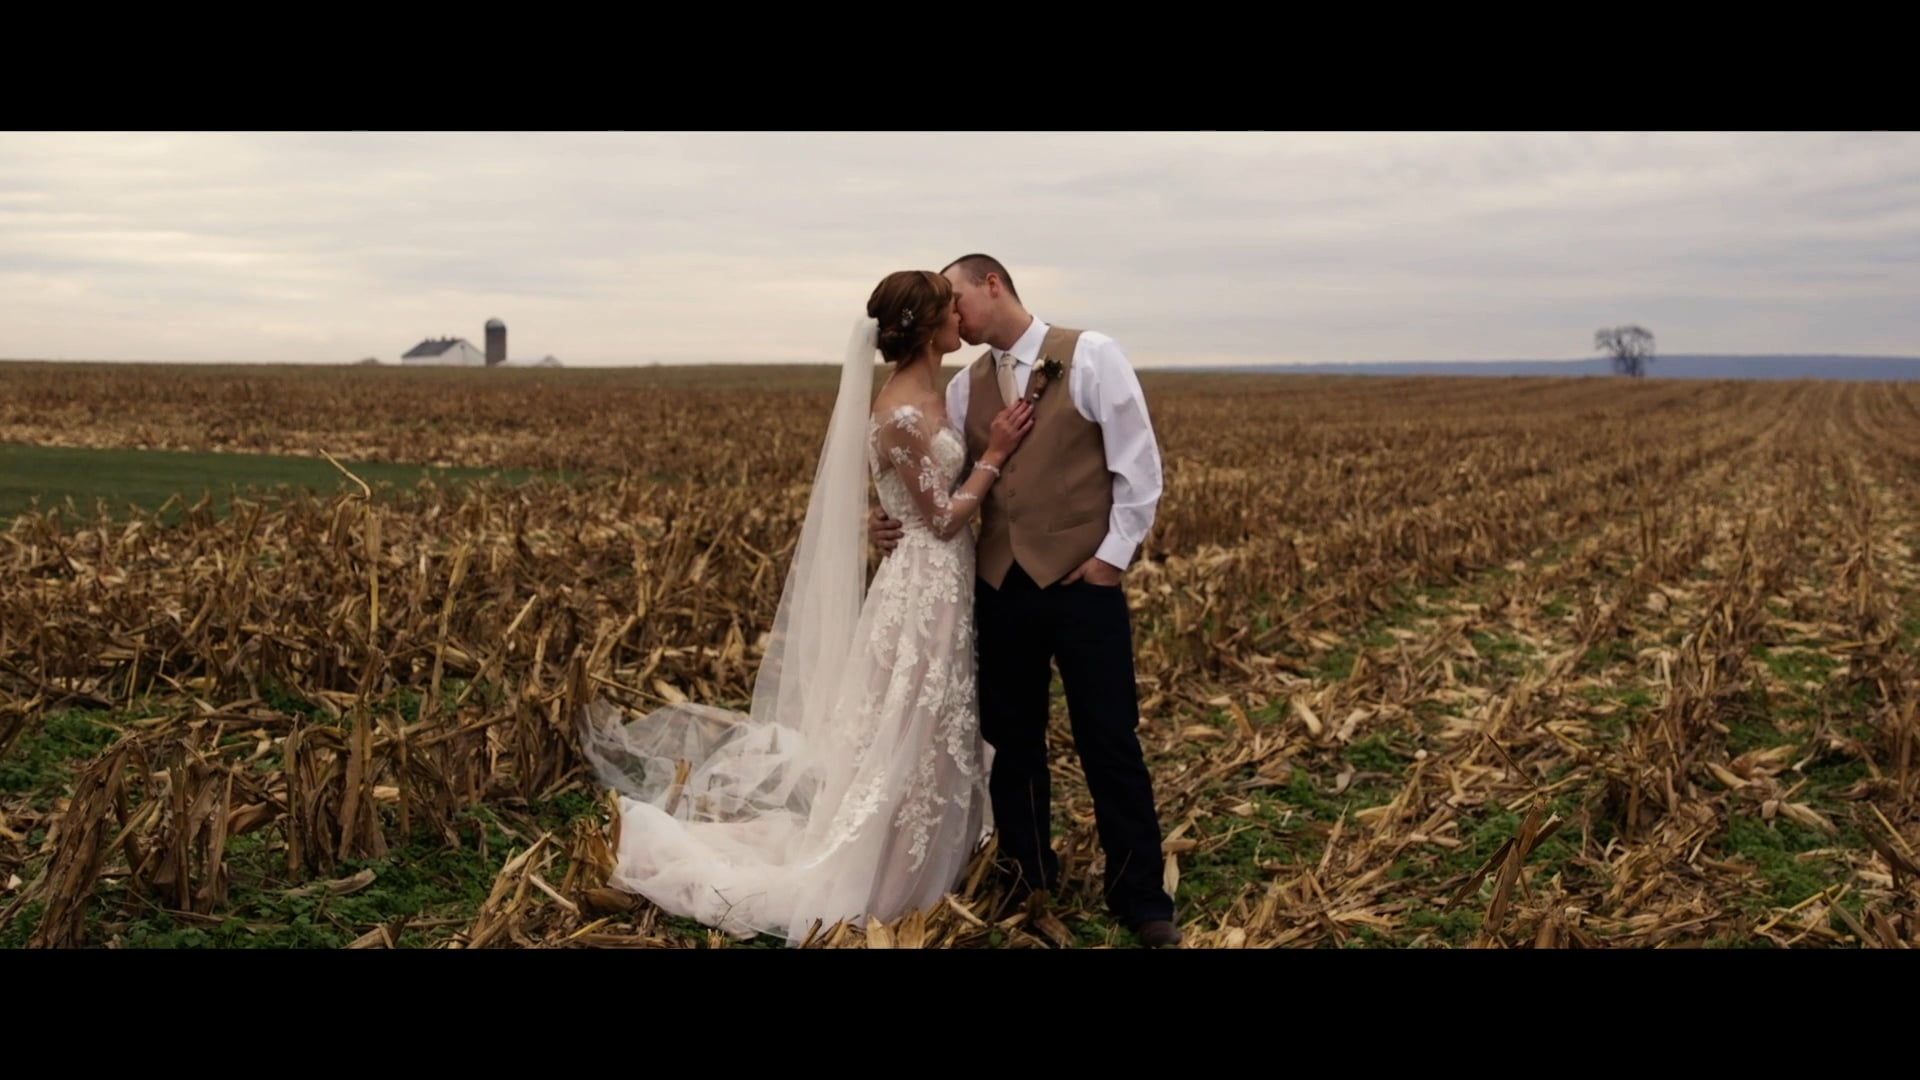 Kam + Amber's Wedding Film